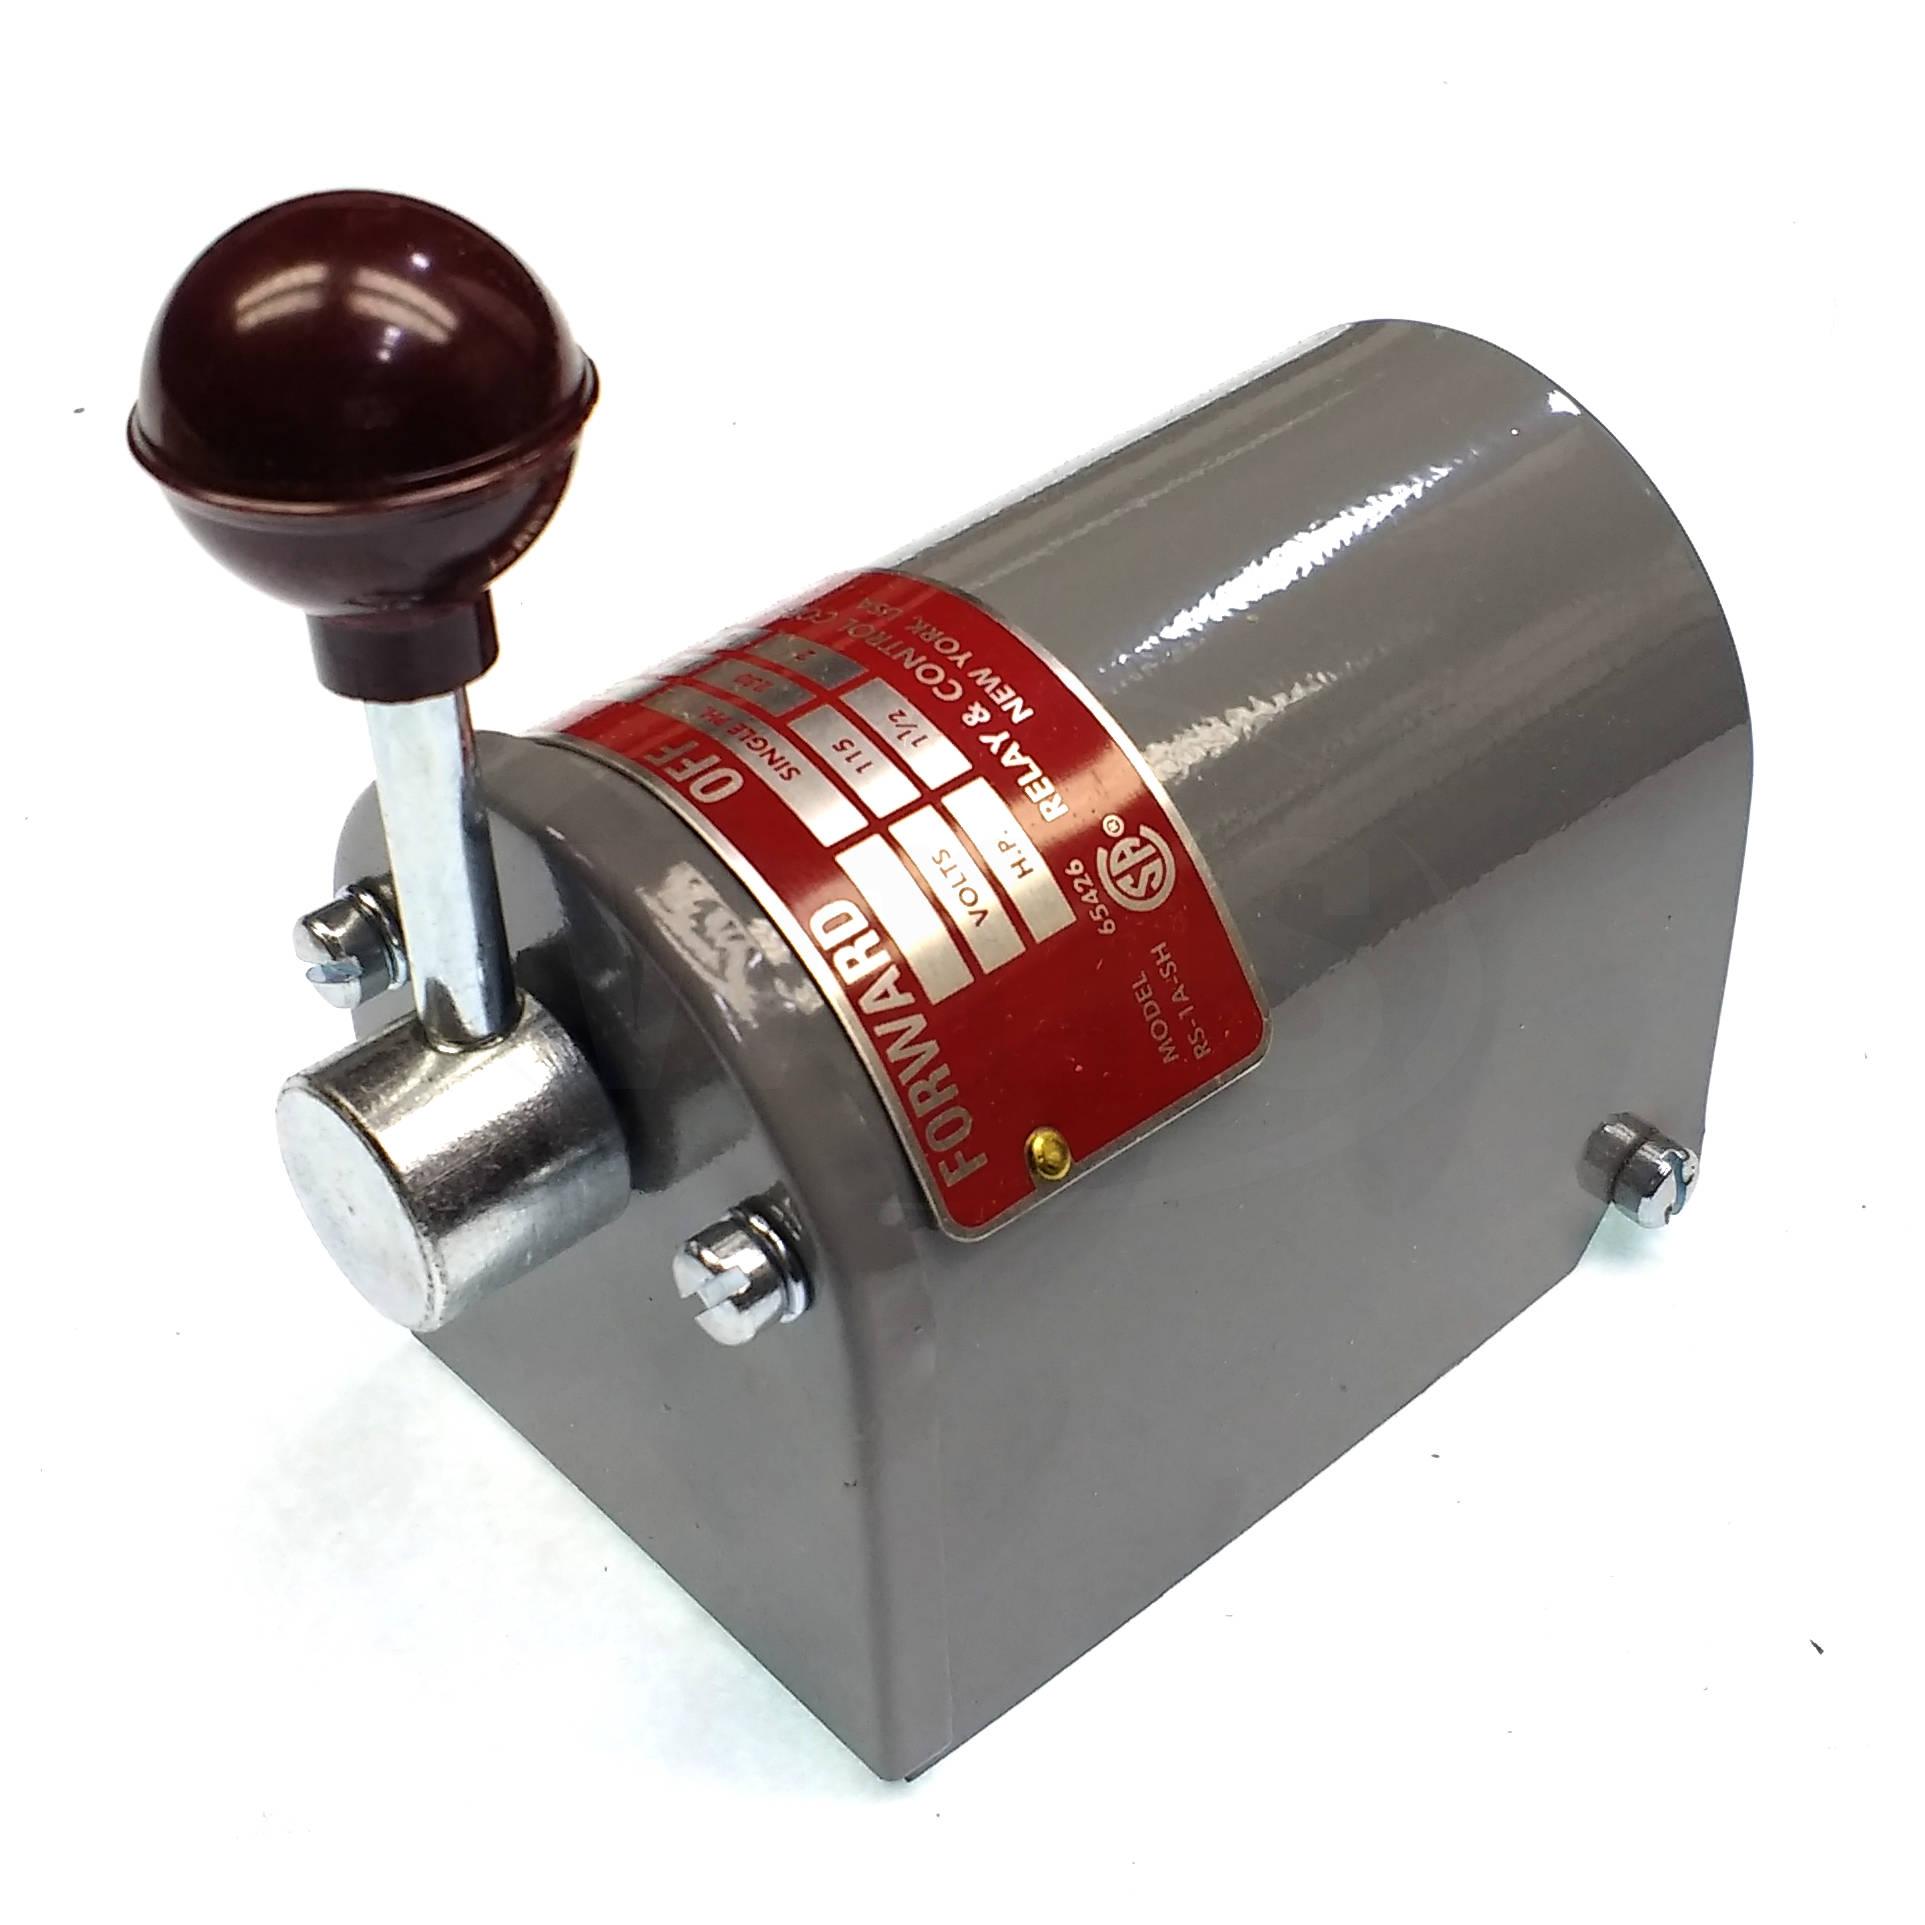 Single Phase Motor Wiring Diagrams Also Single Phase Motor Wiring